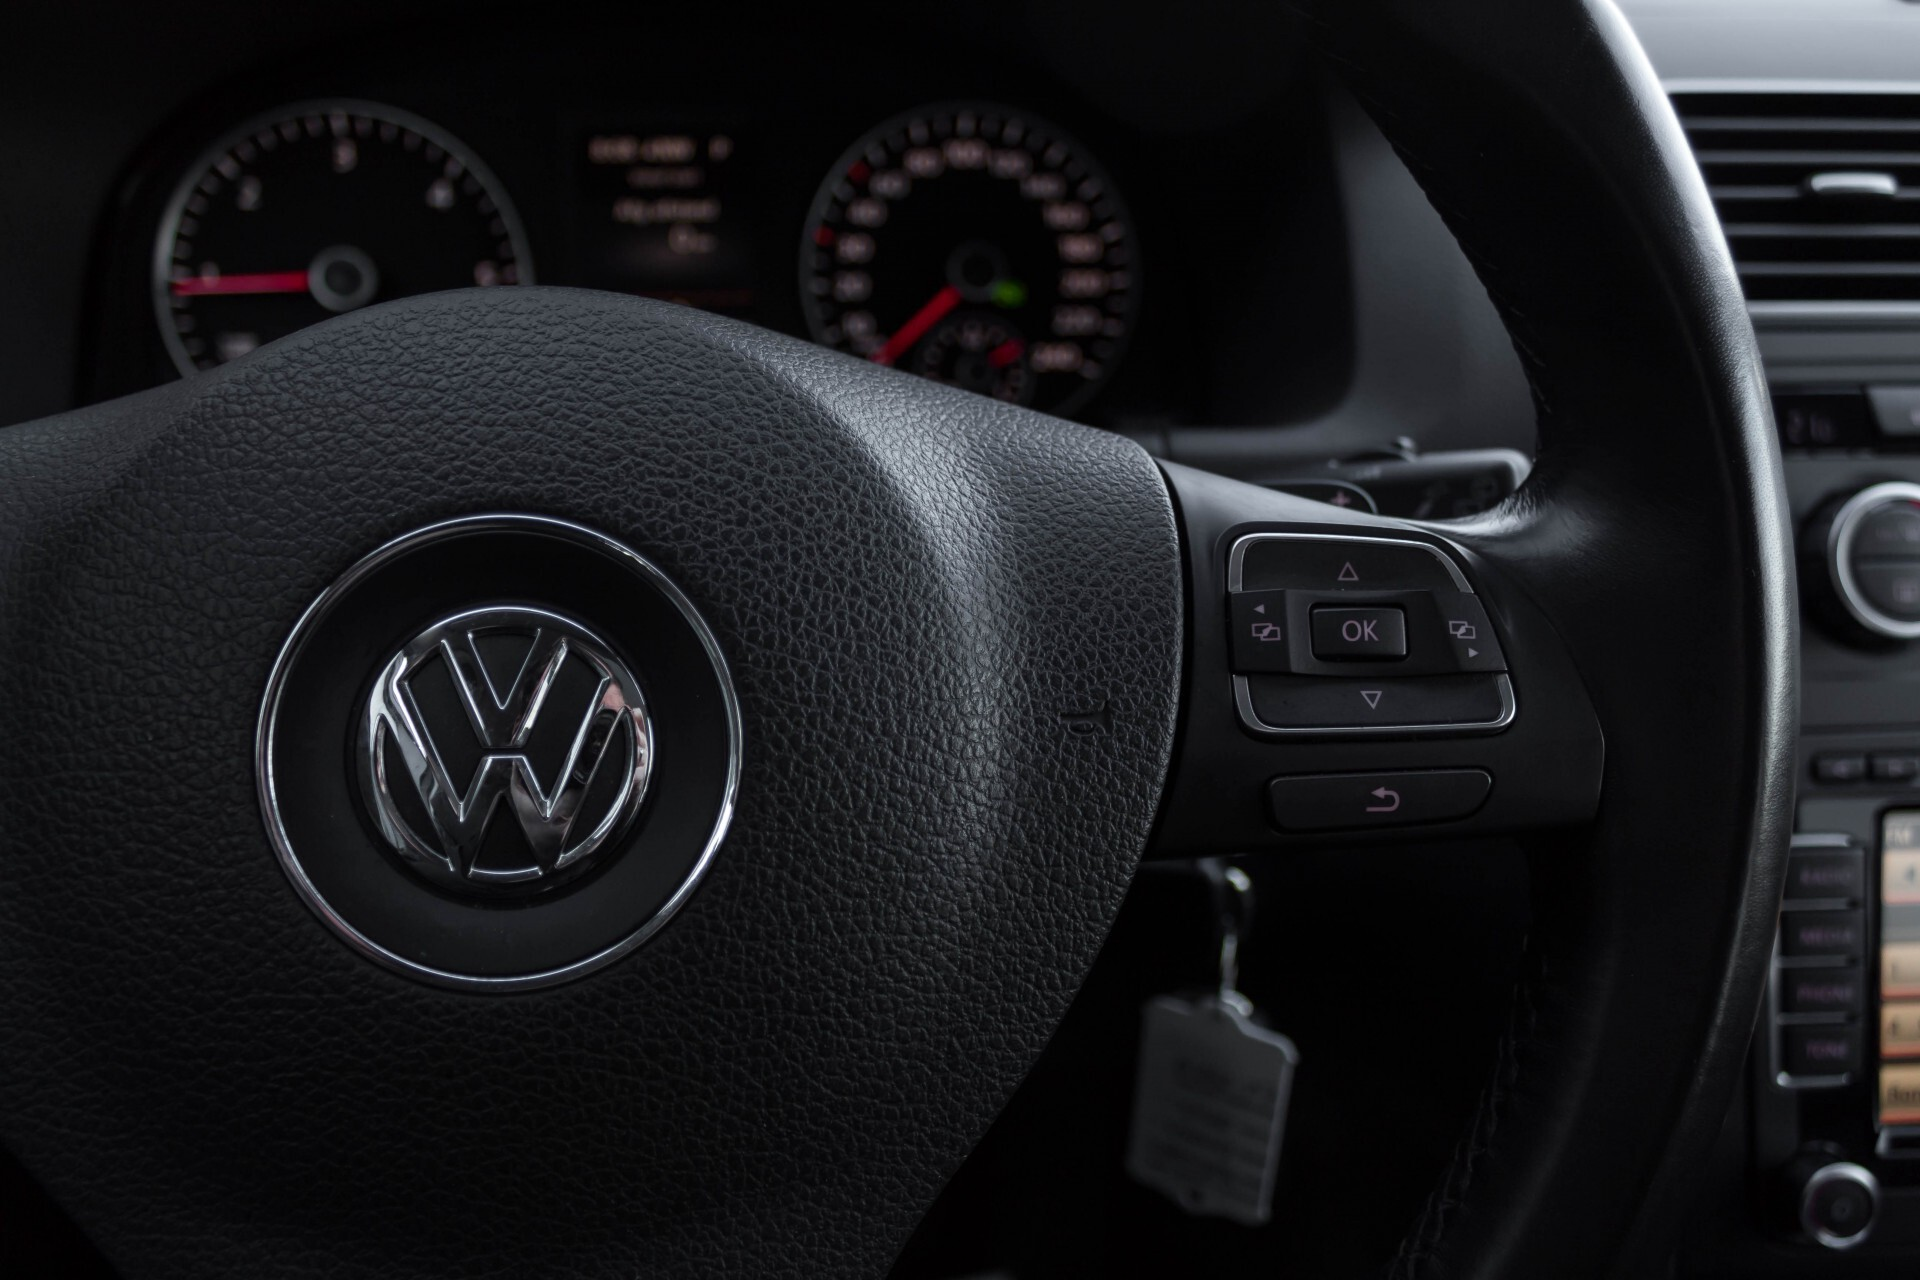 Volkswagen Touran 2.0 TDI Highline 7Persoons 177pk Panorama/Leder/Navi/Camera/Verw-Stln/Trhk/ECC/Xenon Aut Foto 15